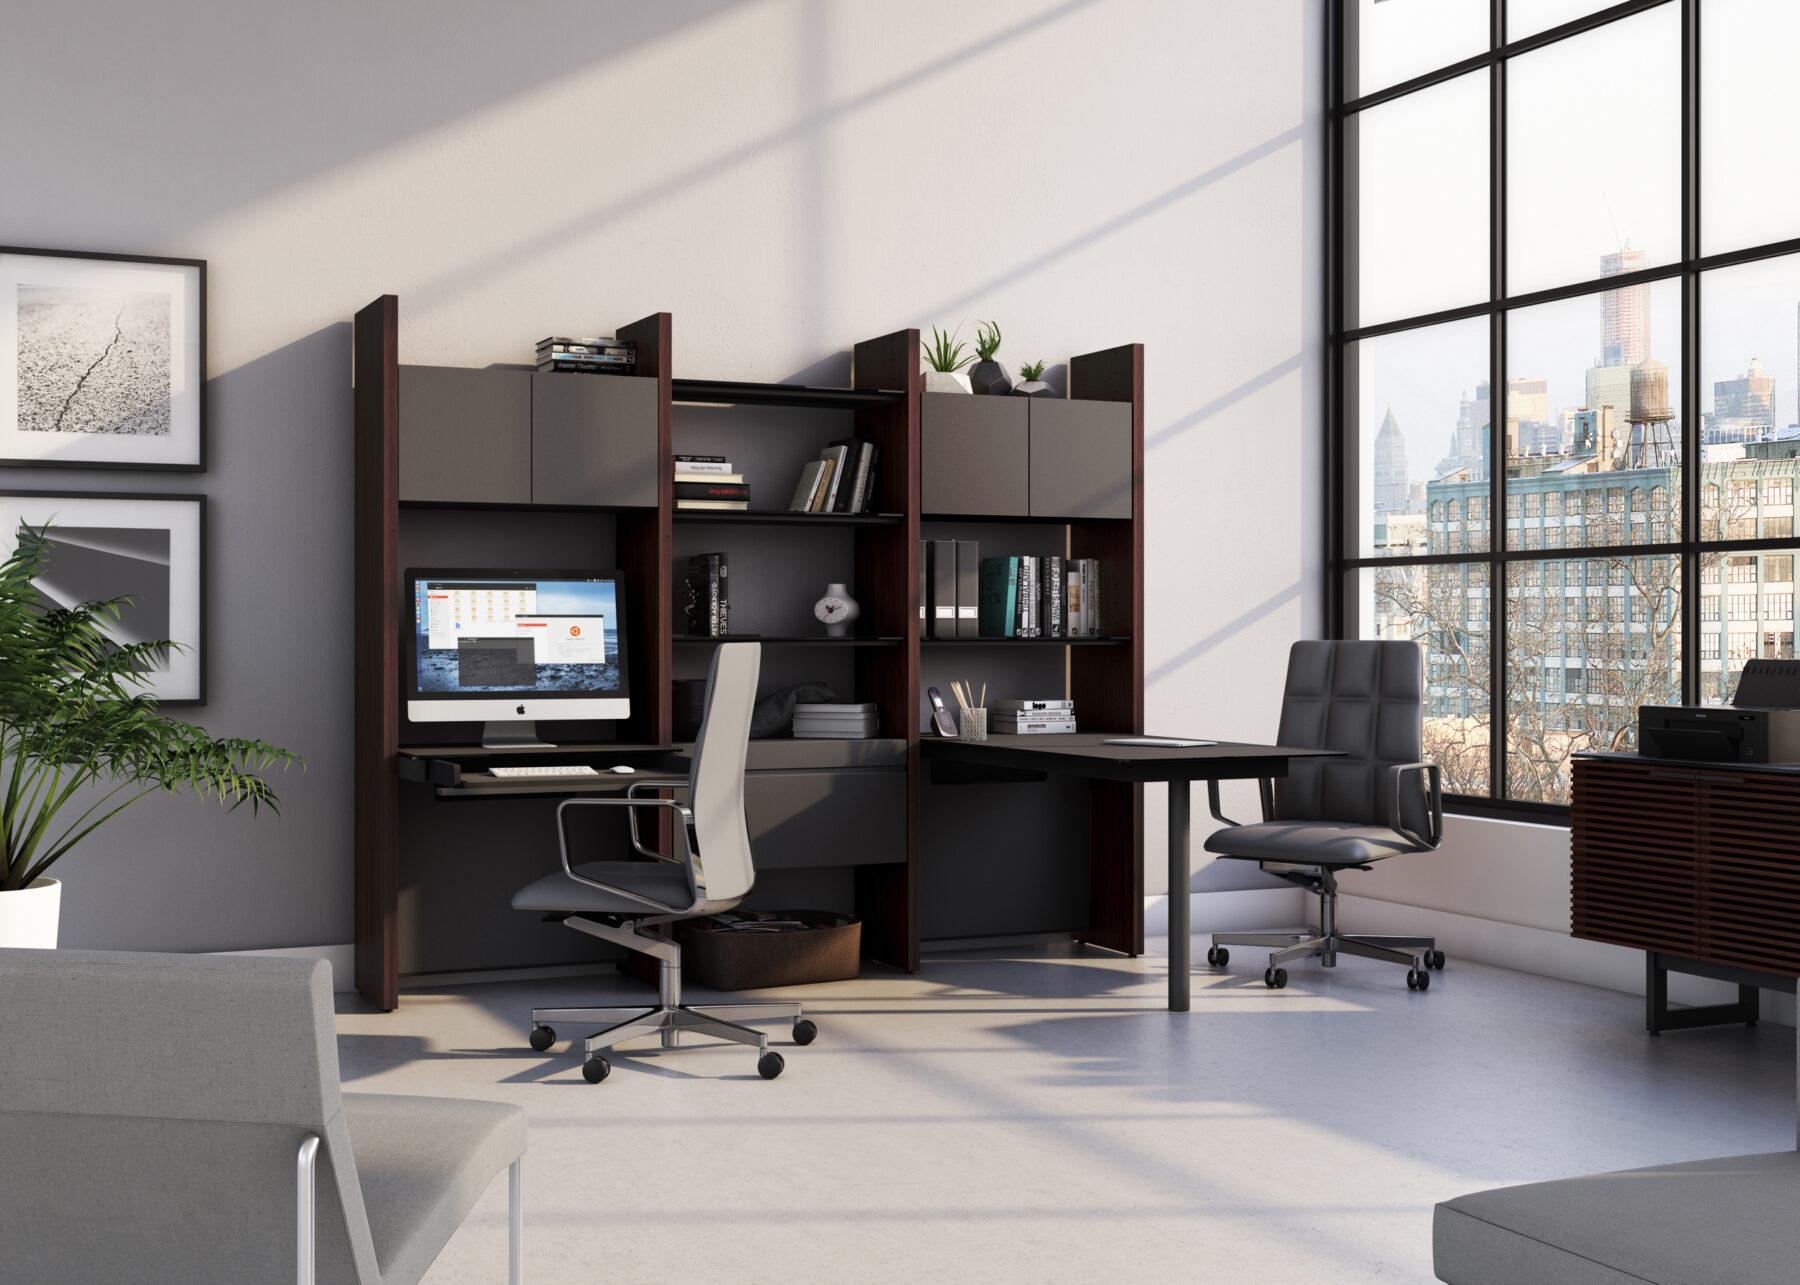 semblance-5431-PD-bdi-chocolate-modular-office-system-lifestyle-1